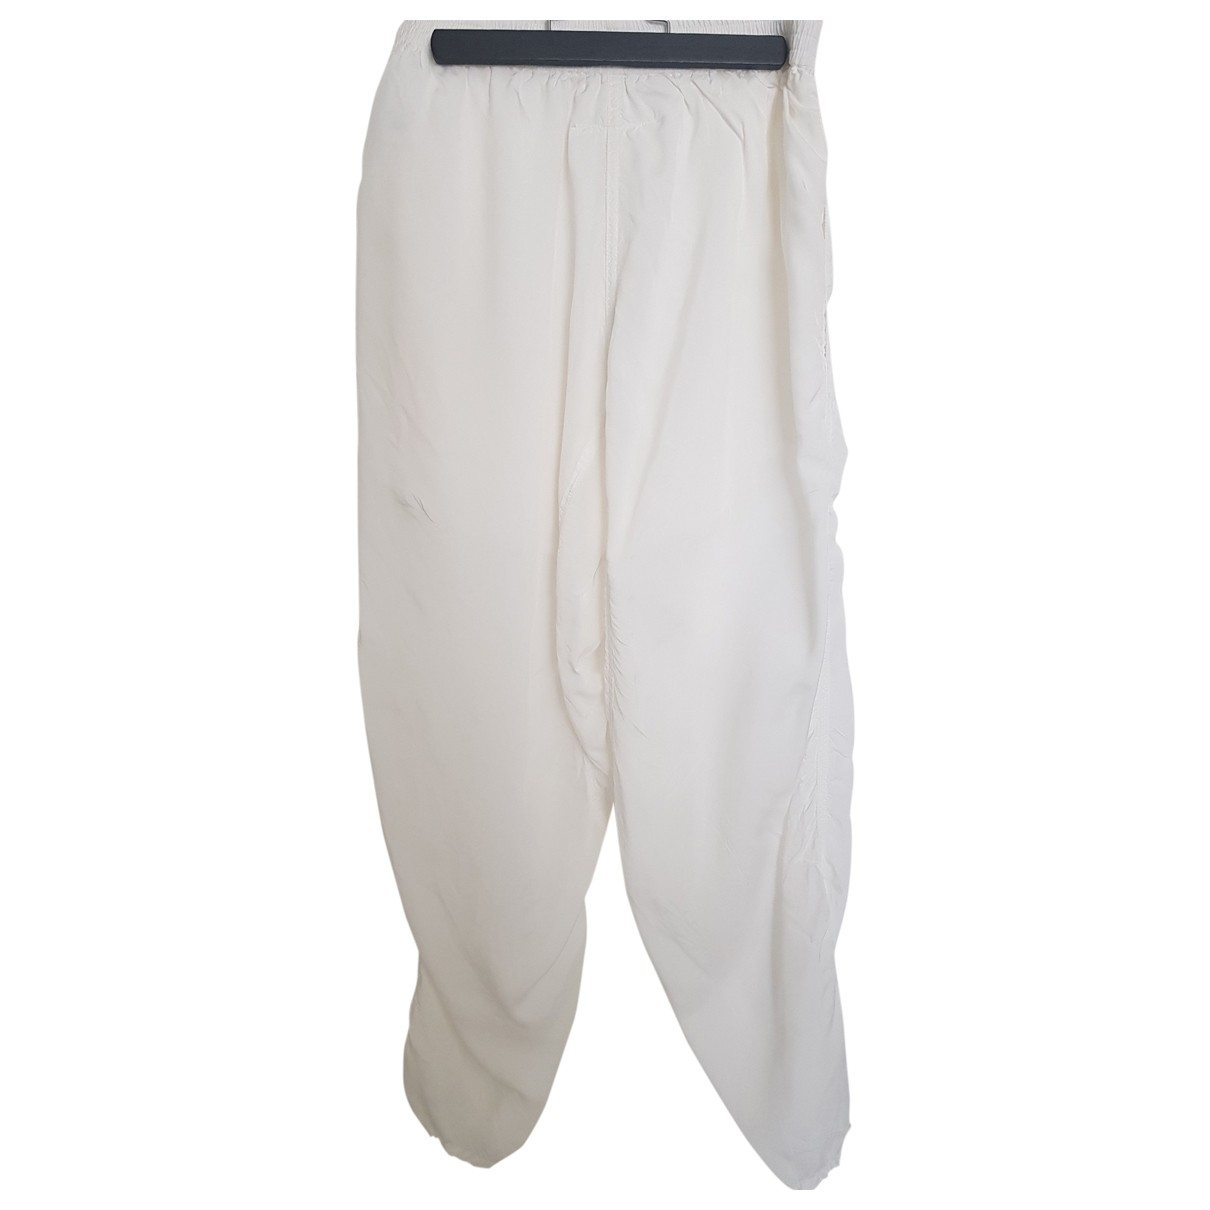 Mm6 \N White Trousers for Women 40 IT